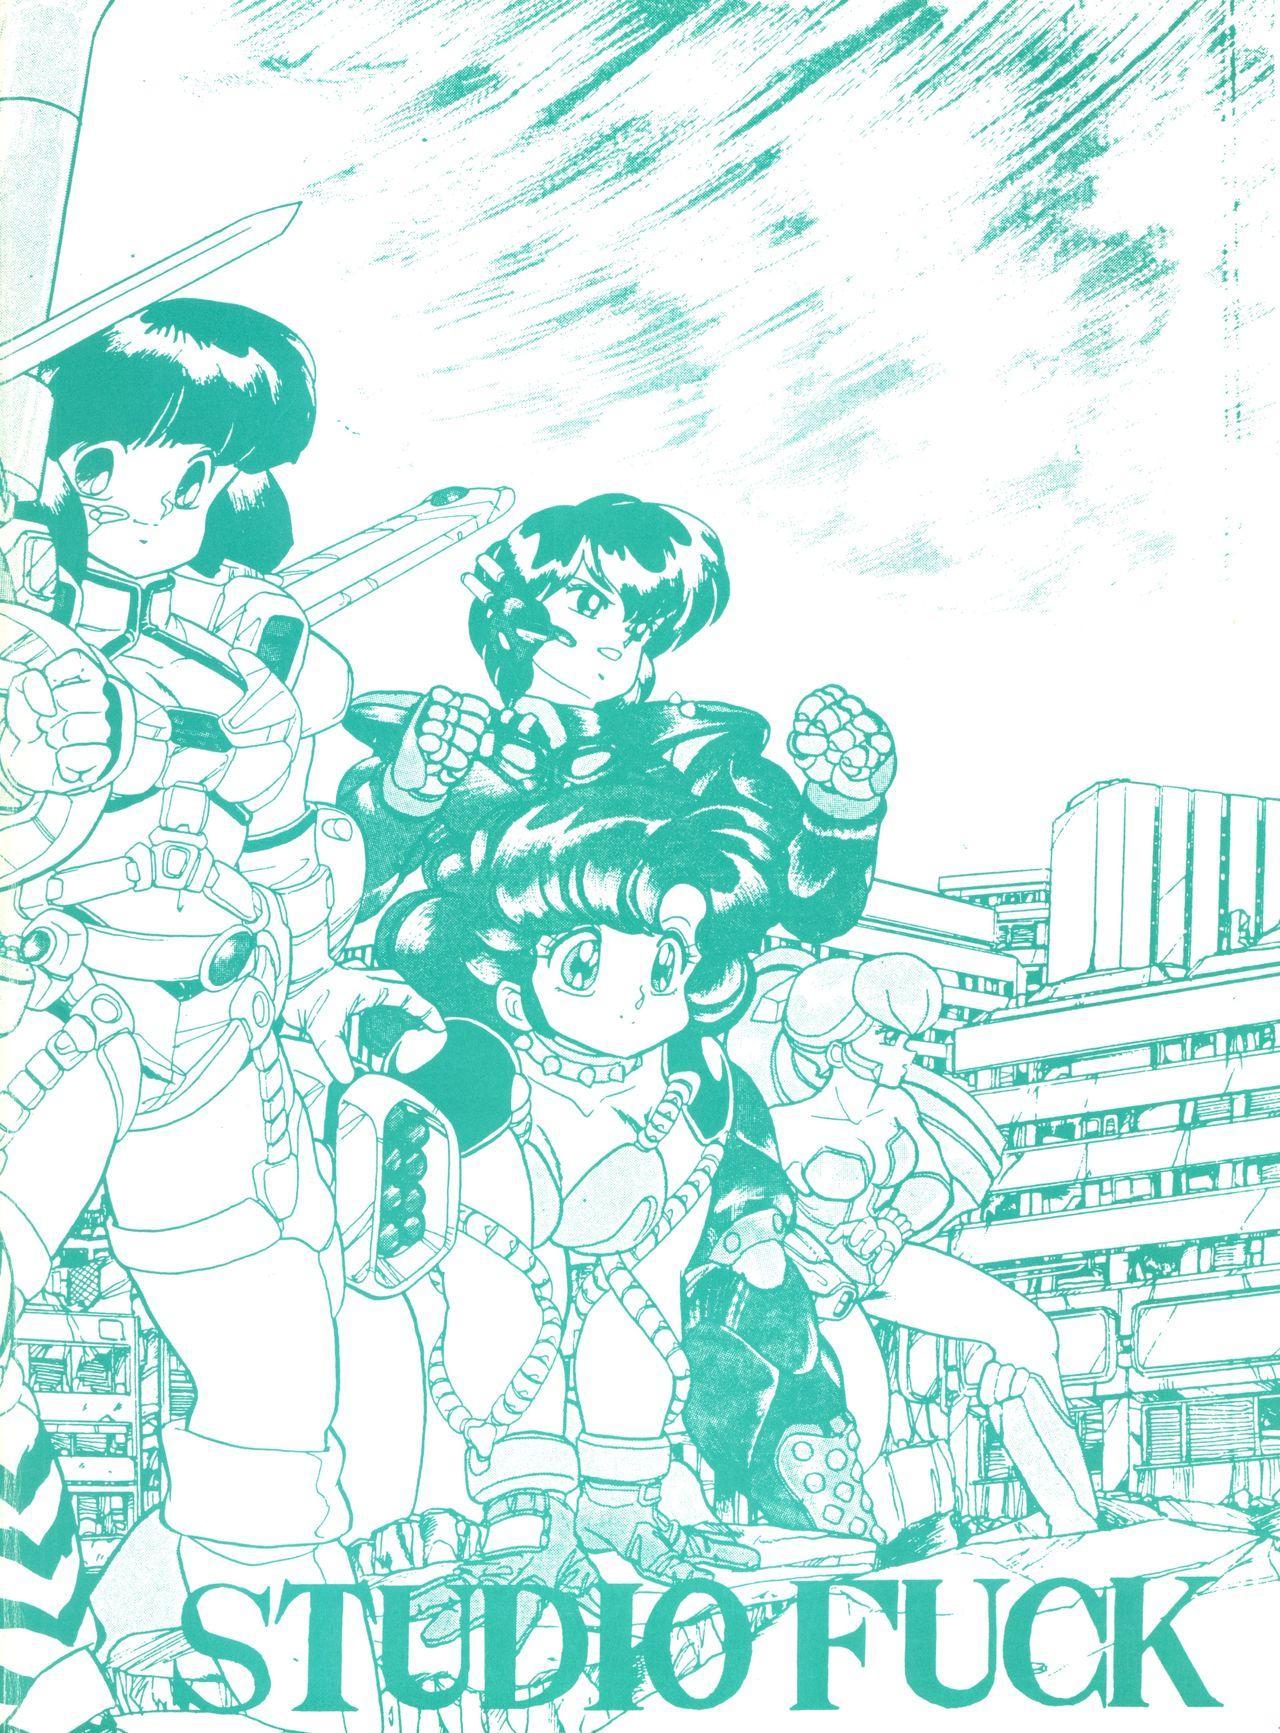 [Studio Fuck (Various) Onapet 7 (Sonic Soldier Borgman, Gundam ZZ, Osomatsu-kun) 86